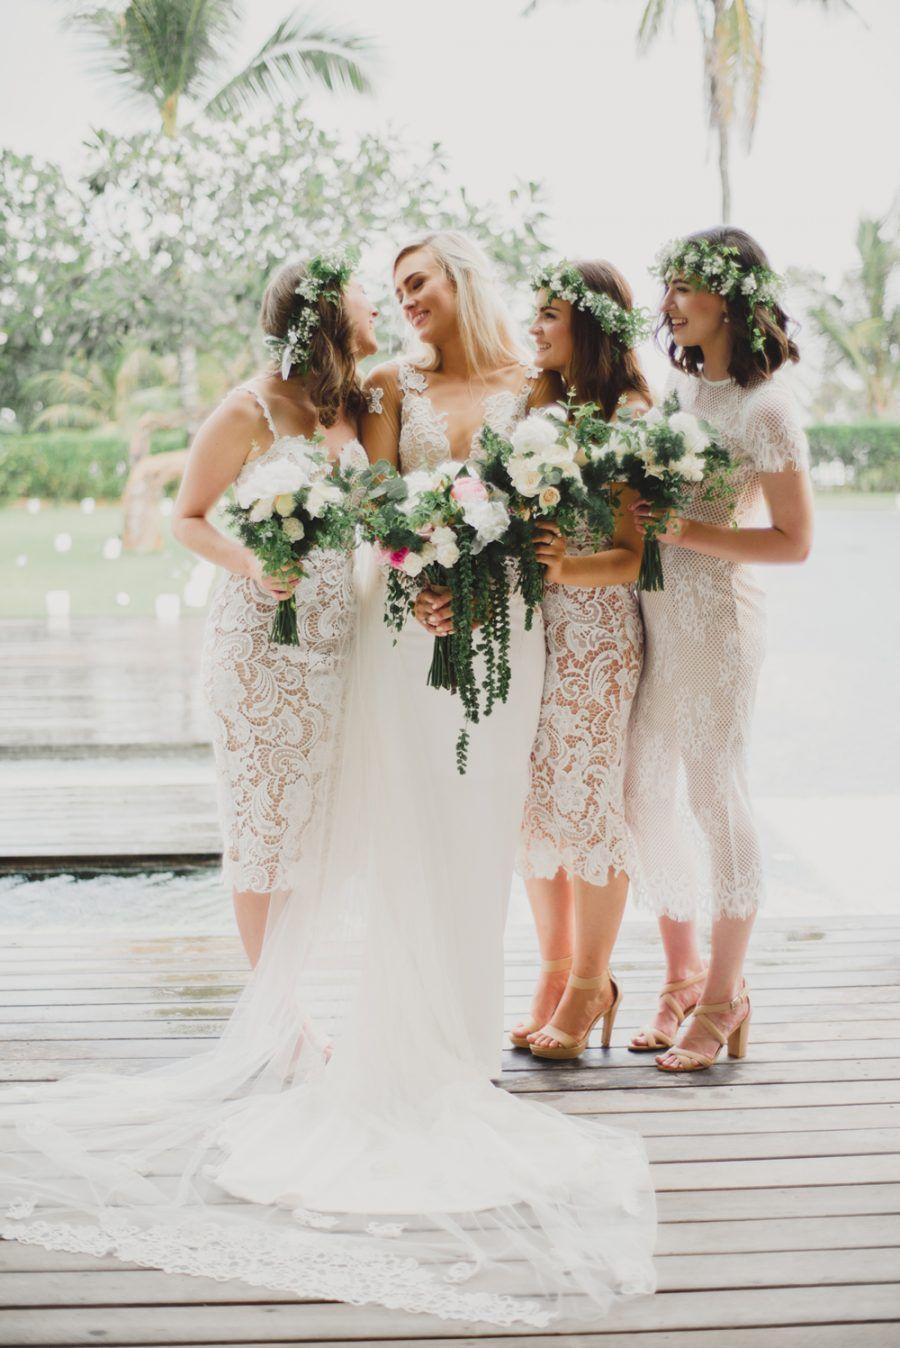 White lace boho bridesmaid dresses